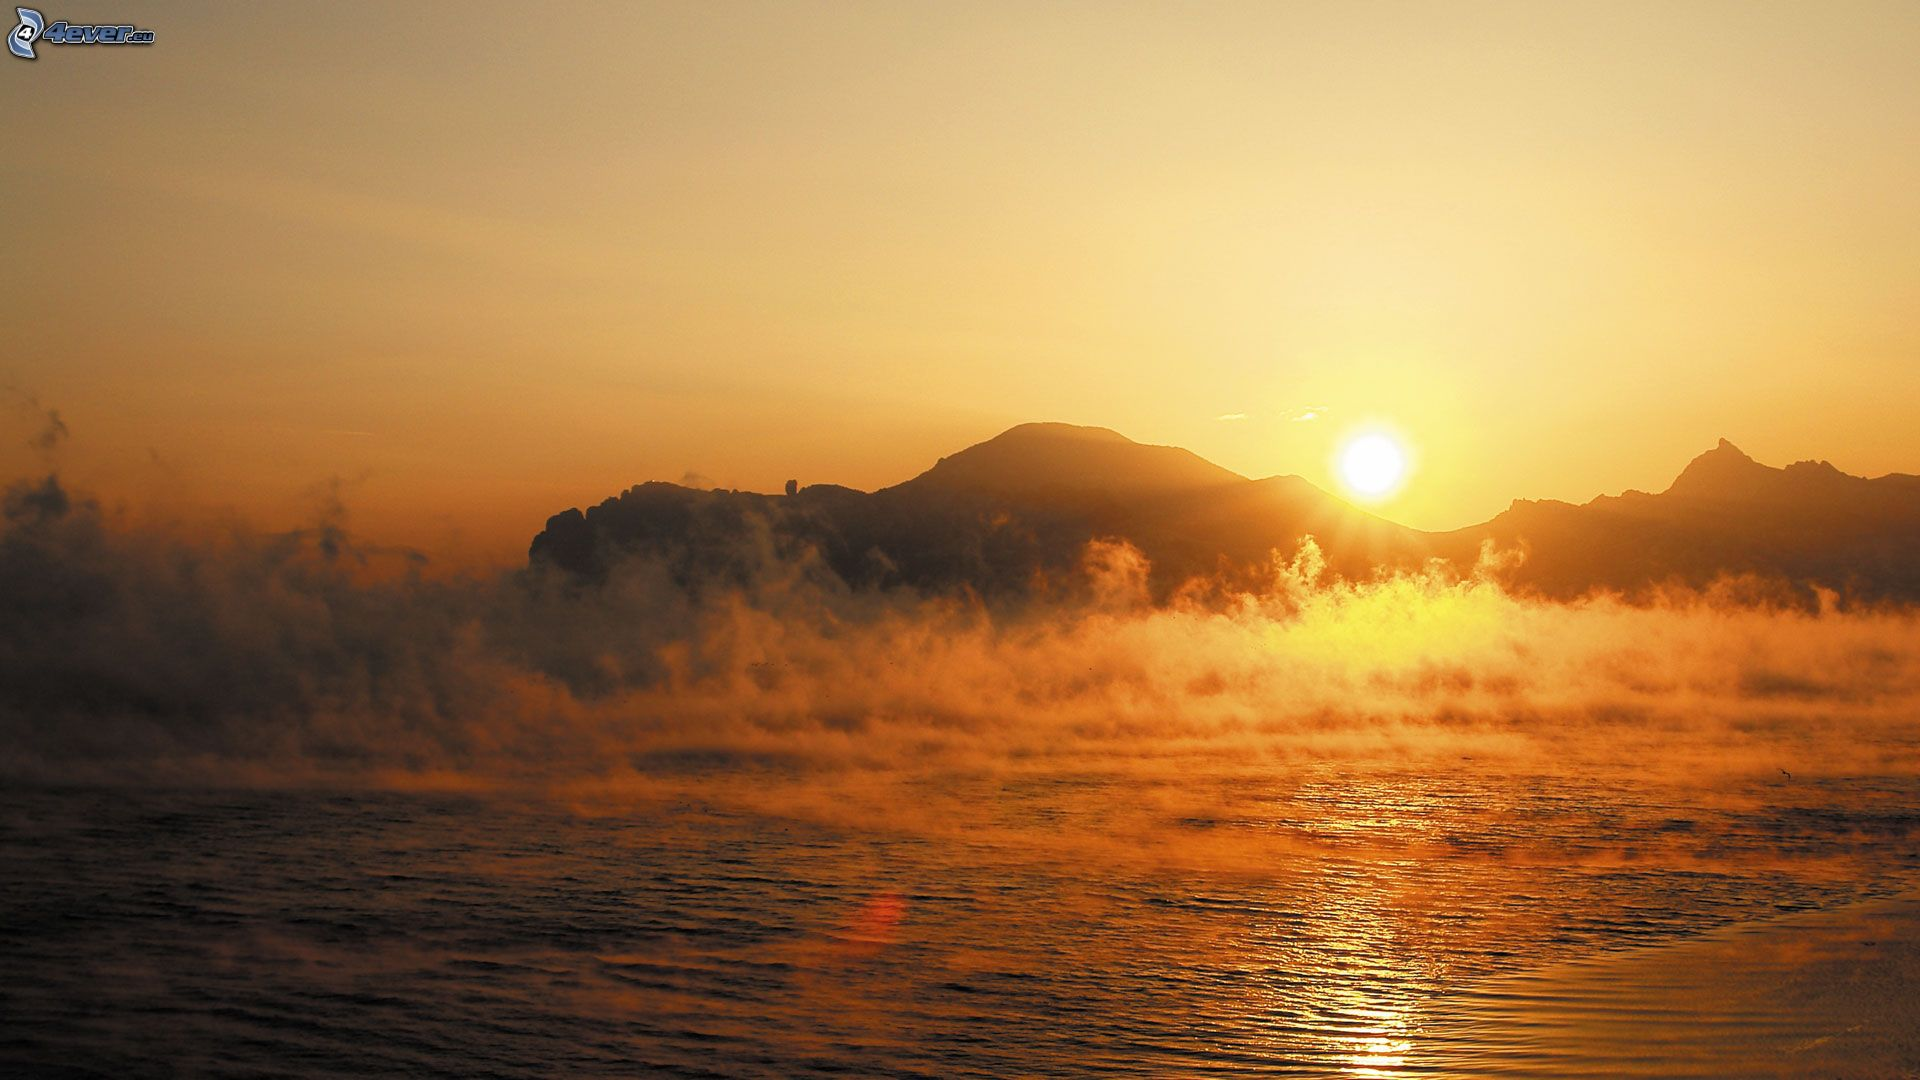 Zalazak sunca  - Page 6 Zapad-slnka-za-kopcom,-jazero-154238